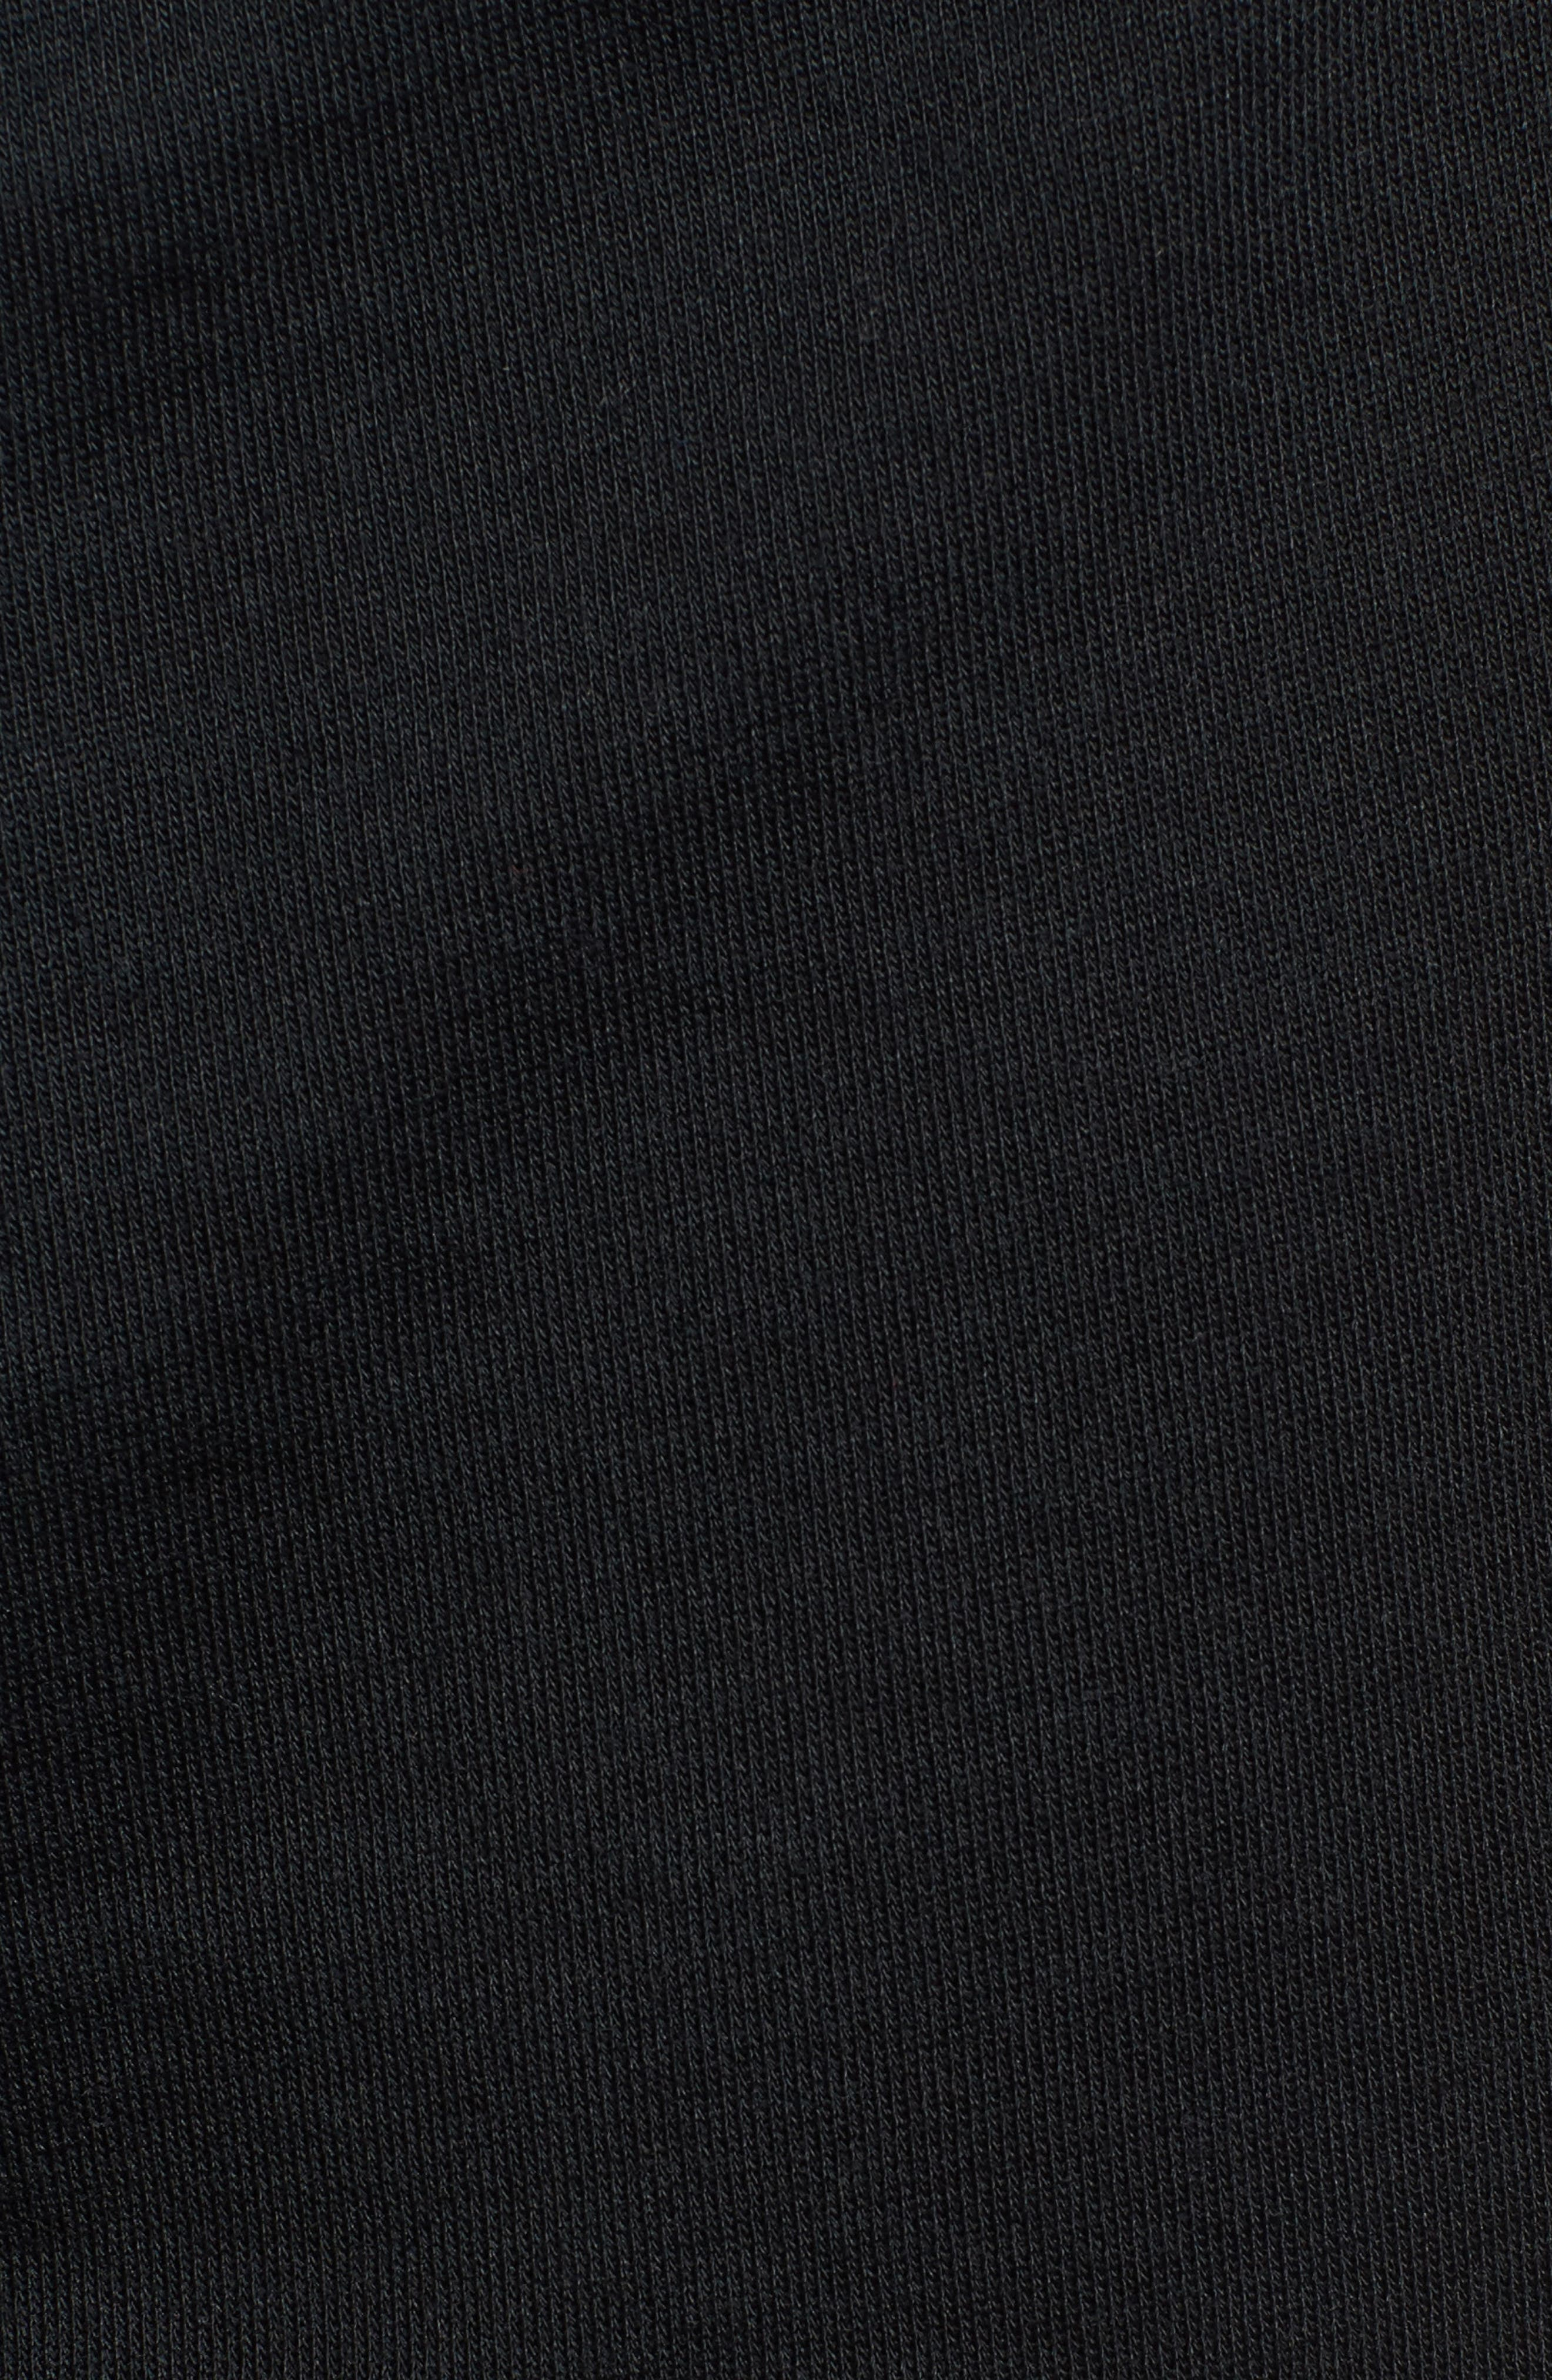 Campus Jogger Pants,                             Alternate thumbnail 5, color,                             002